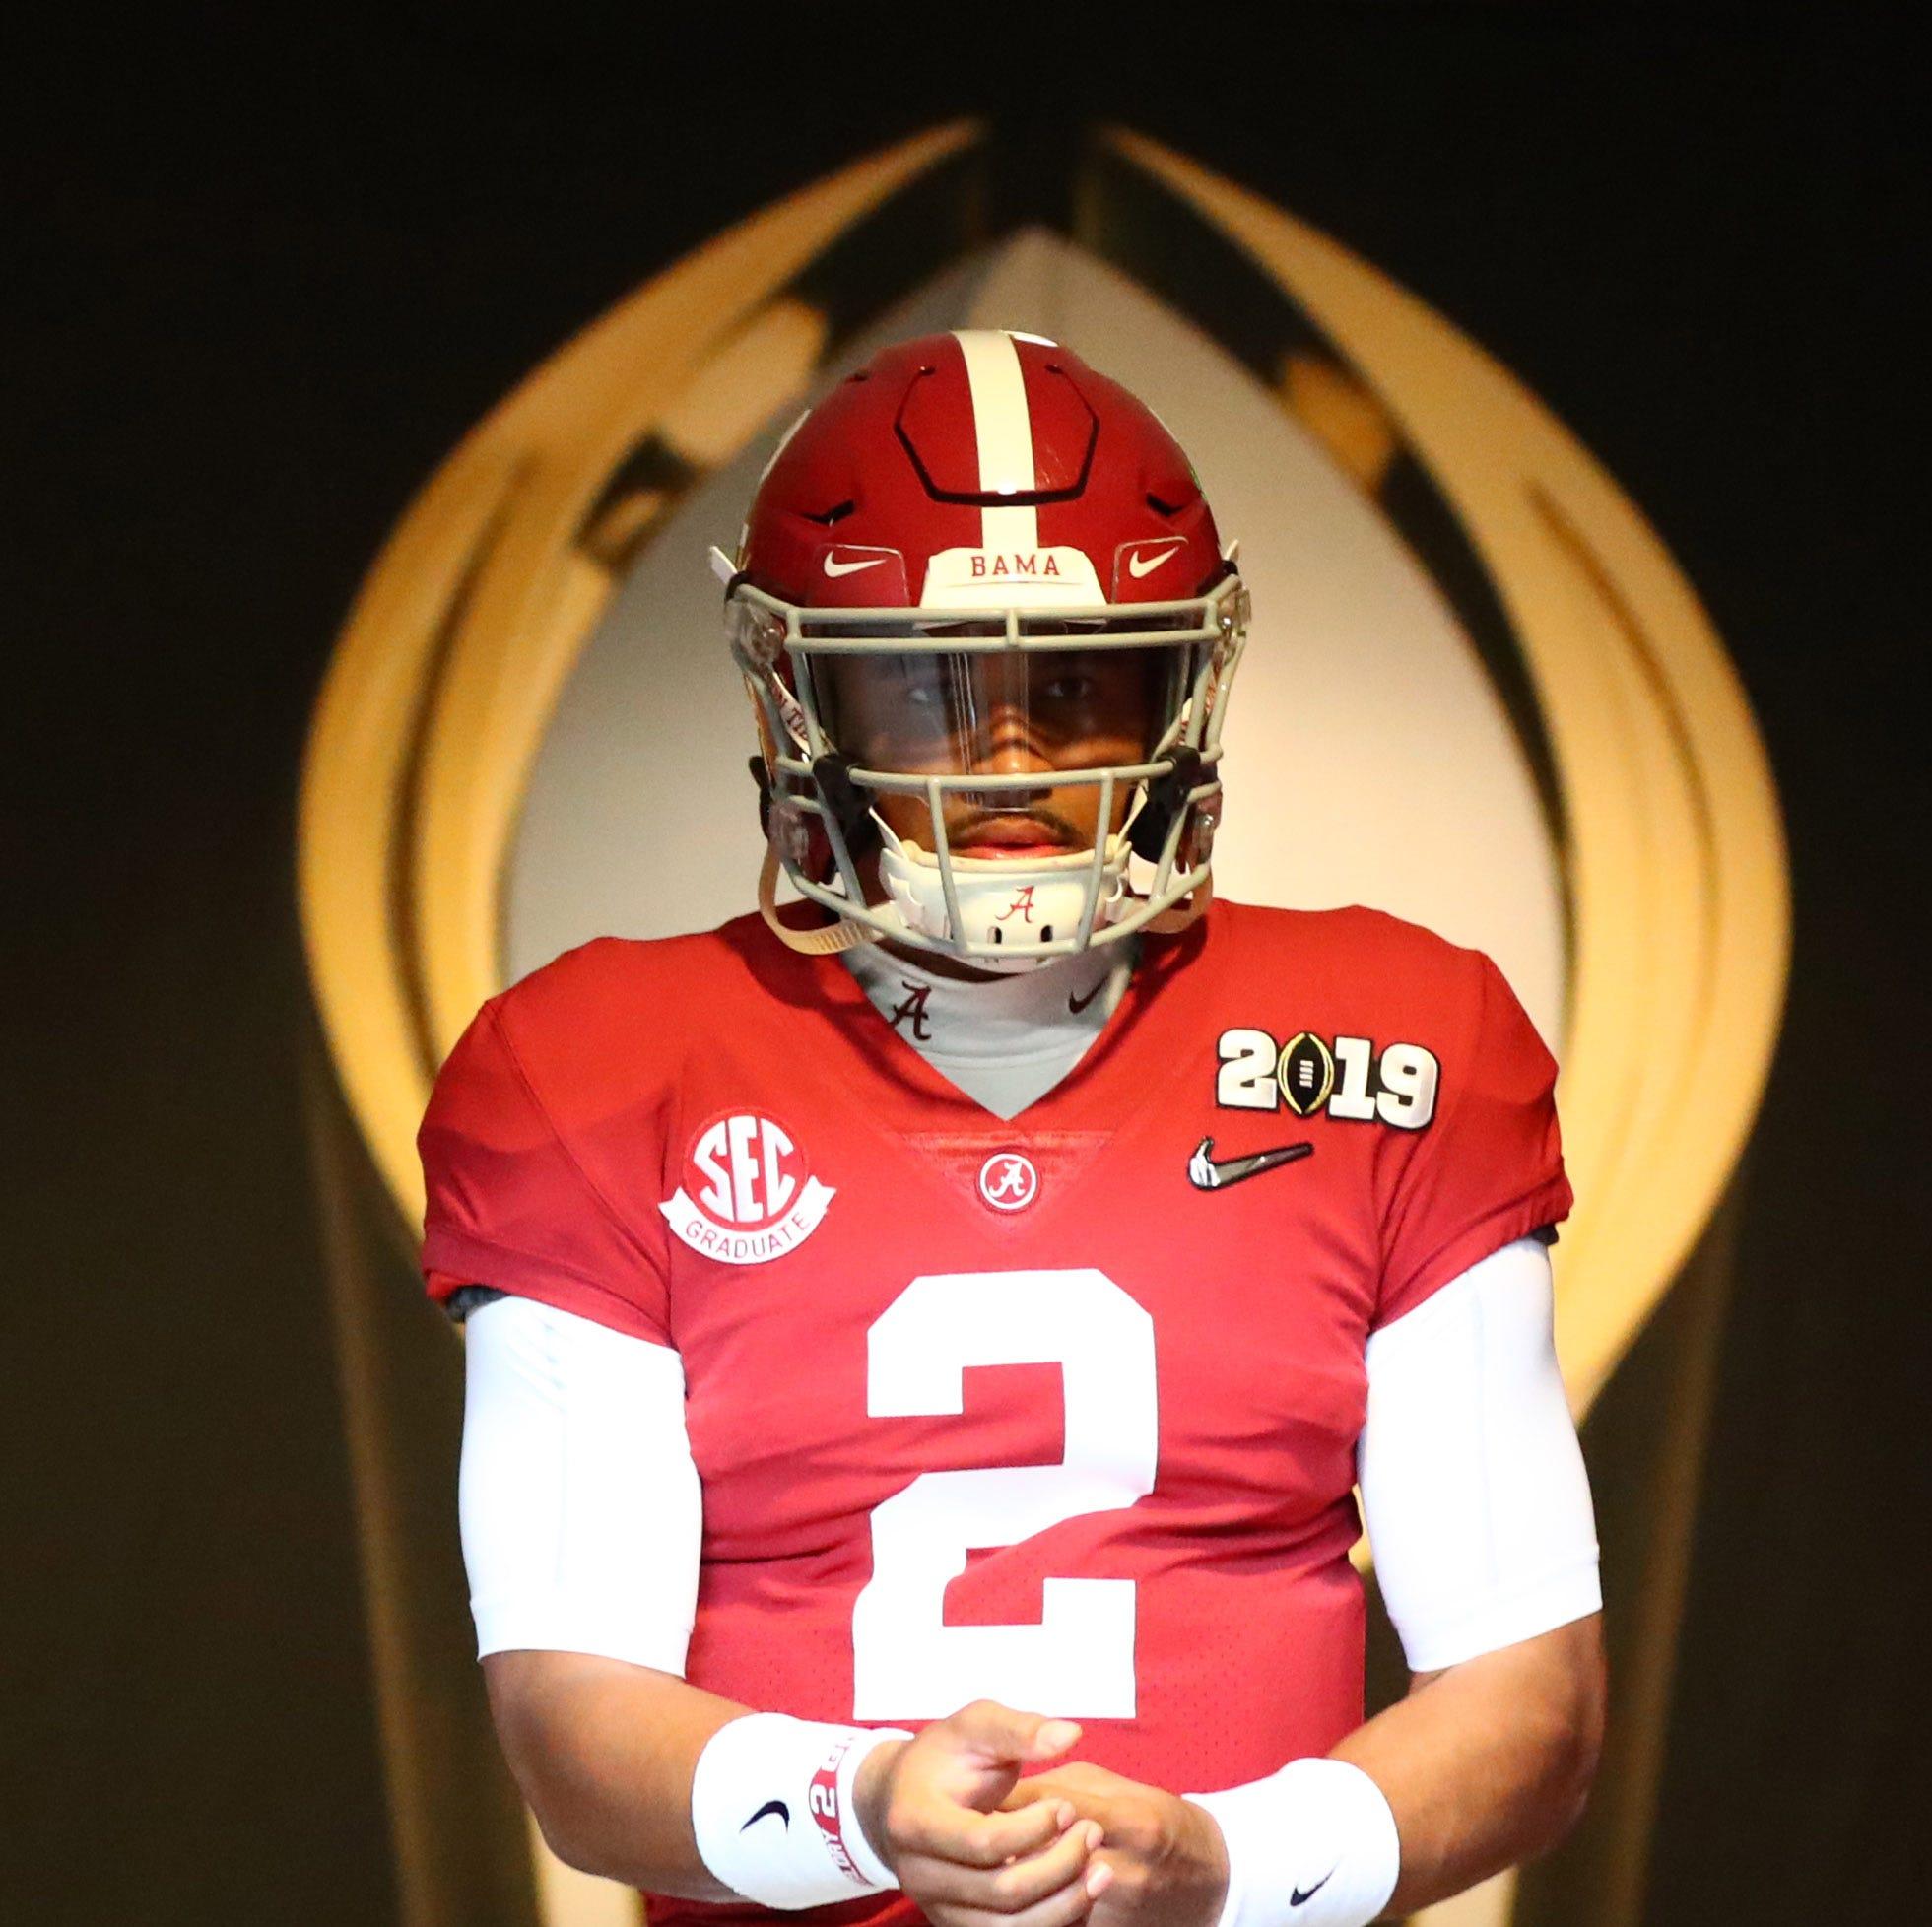 Reports: Alabama QB Jalen Hurts' name in NCAA transfer database